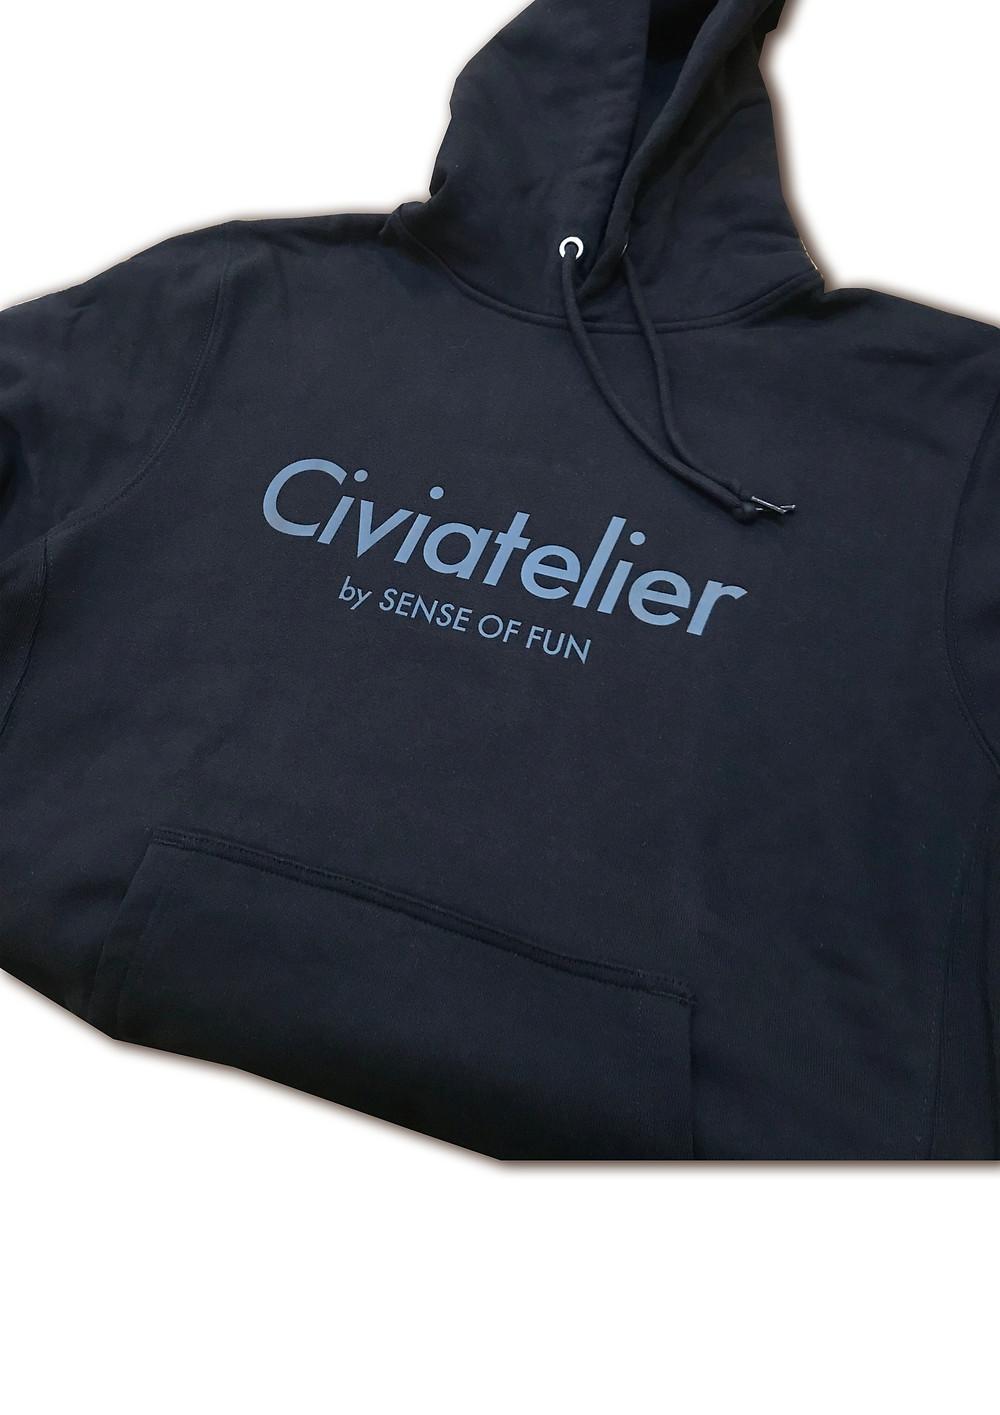 Civiatelier New Logo.